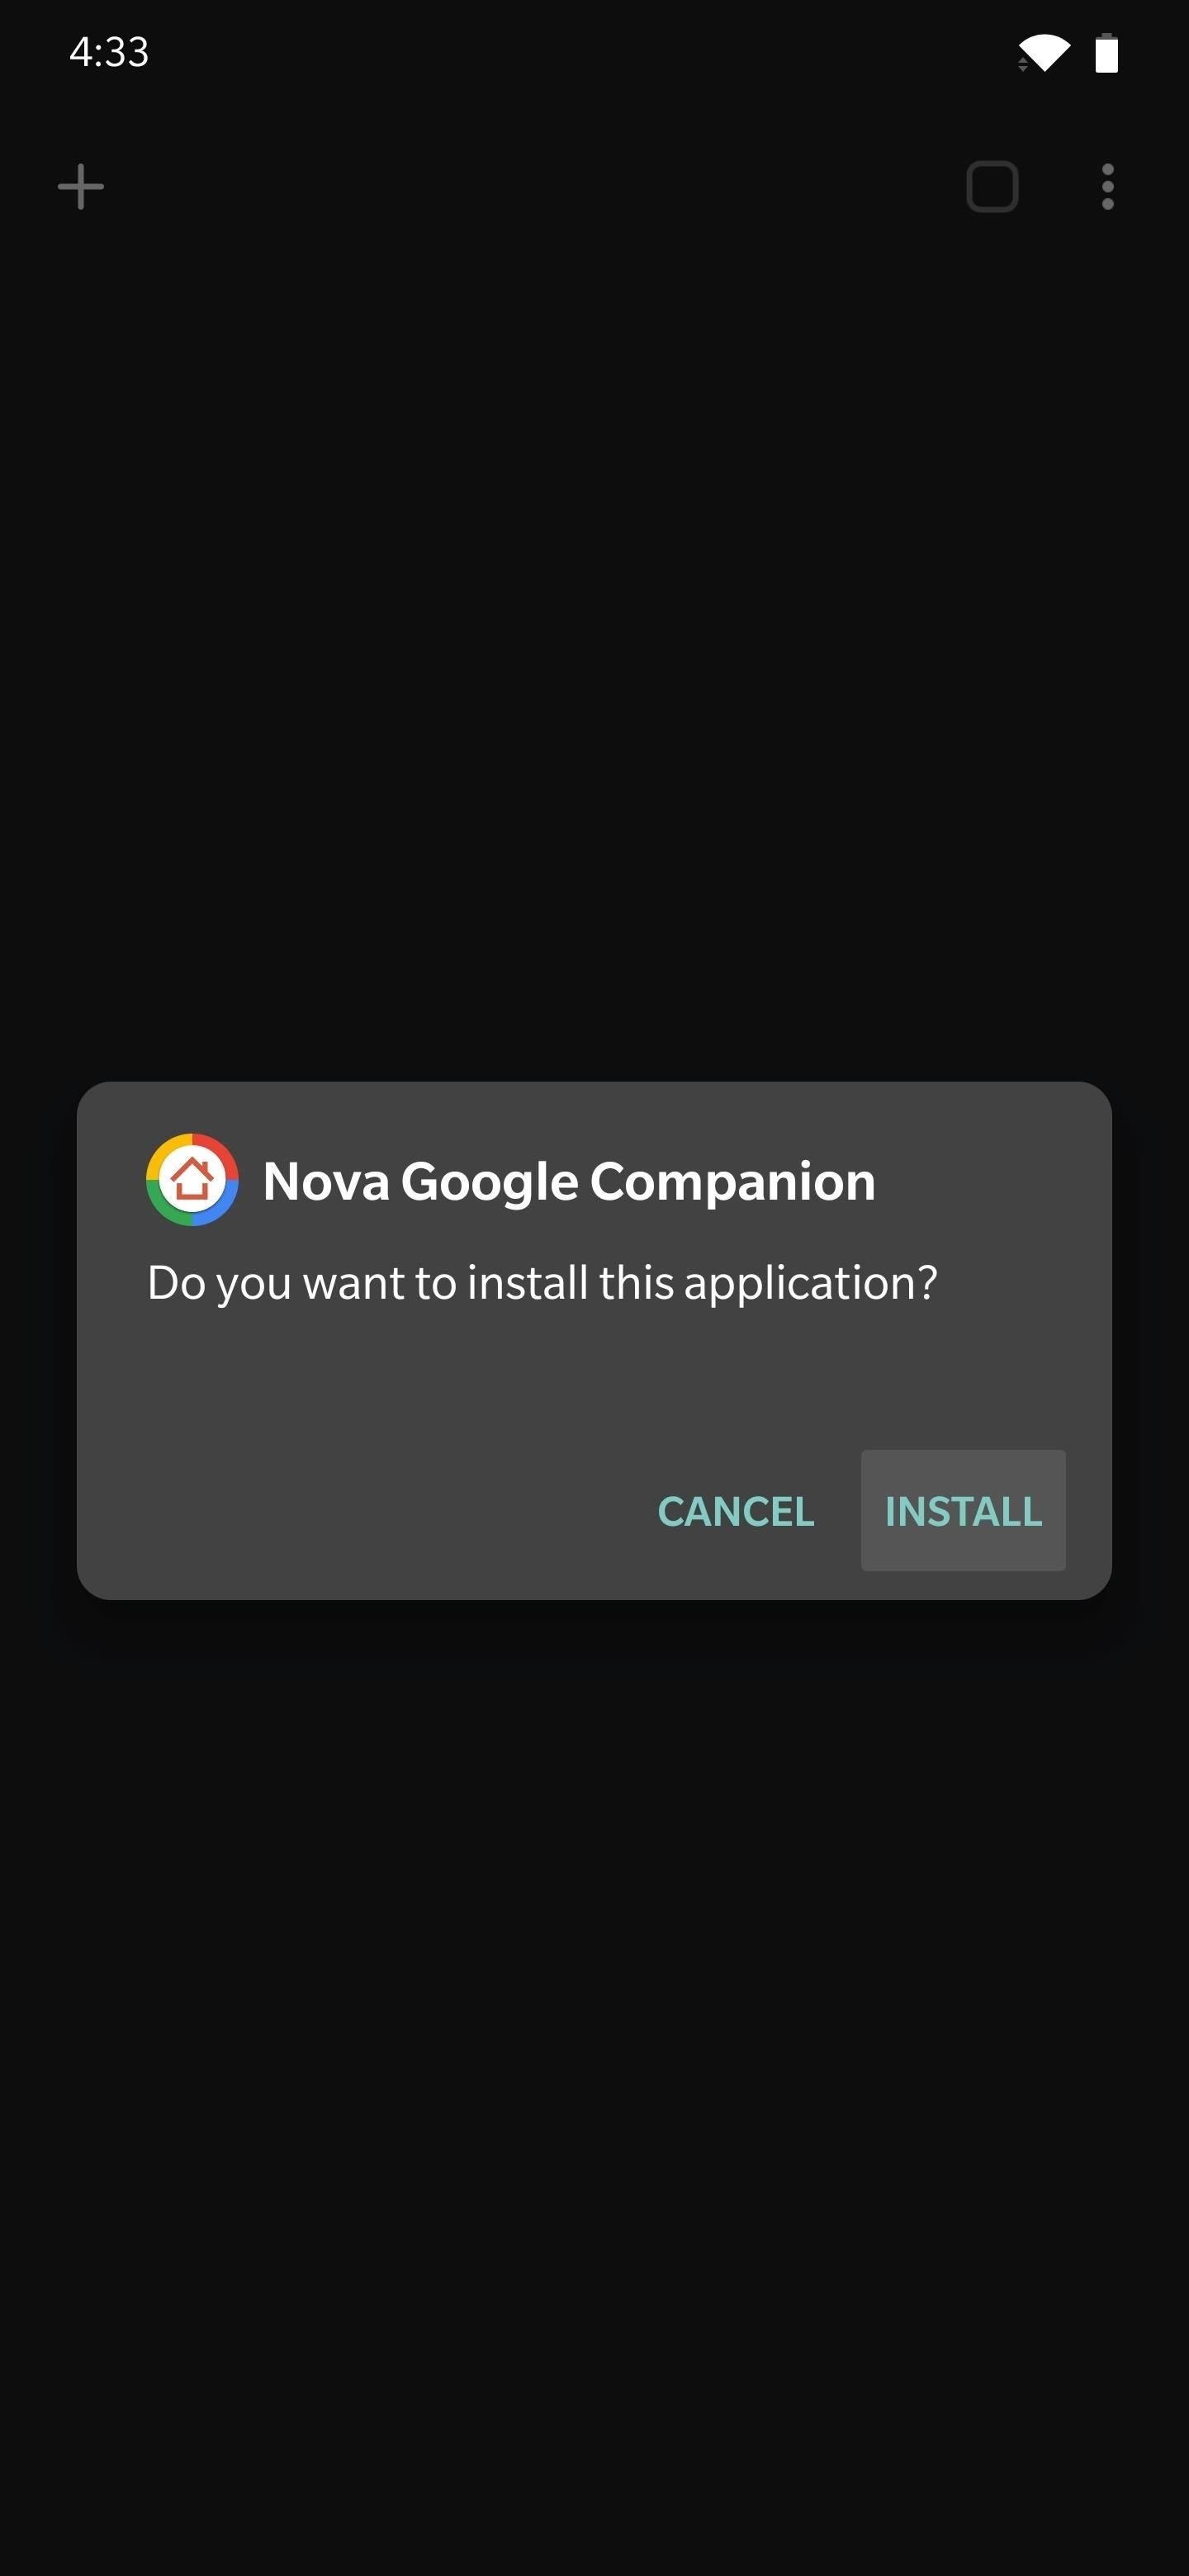 How to Make Nova Launcher Look & Behave Like Google's Pixel Launcher